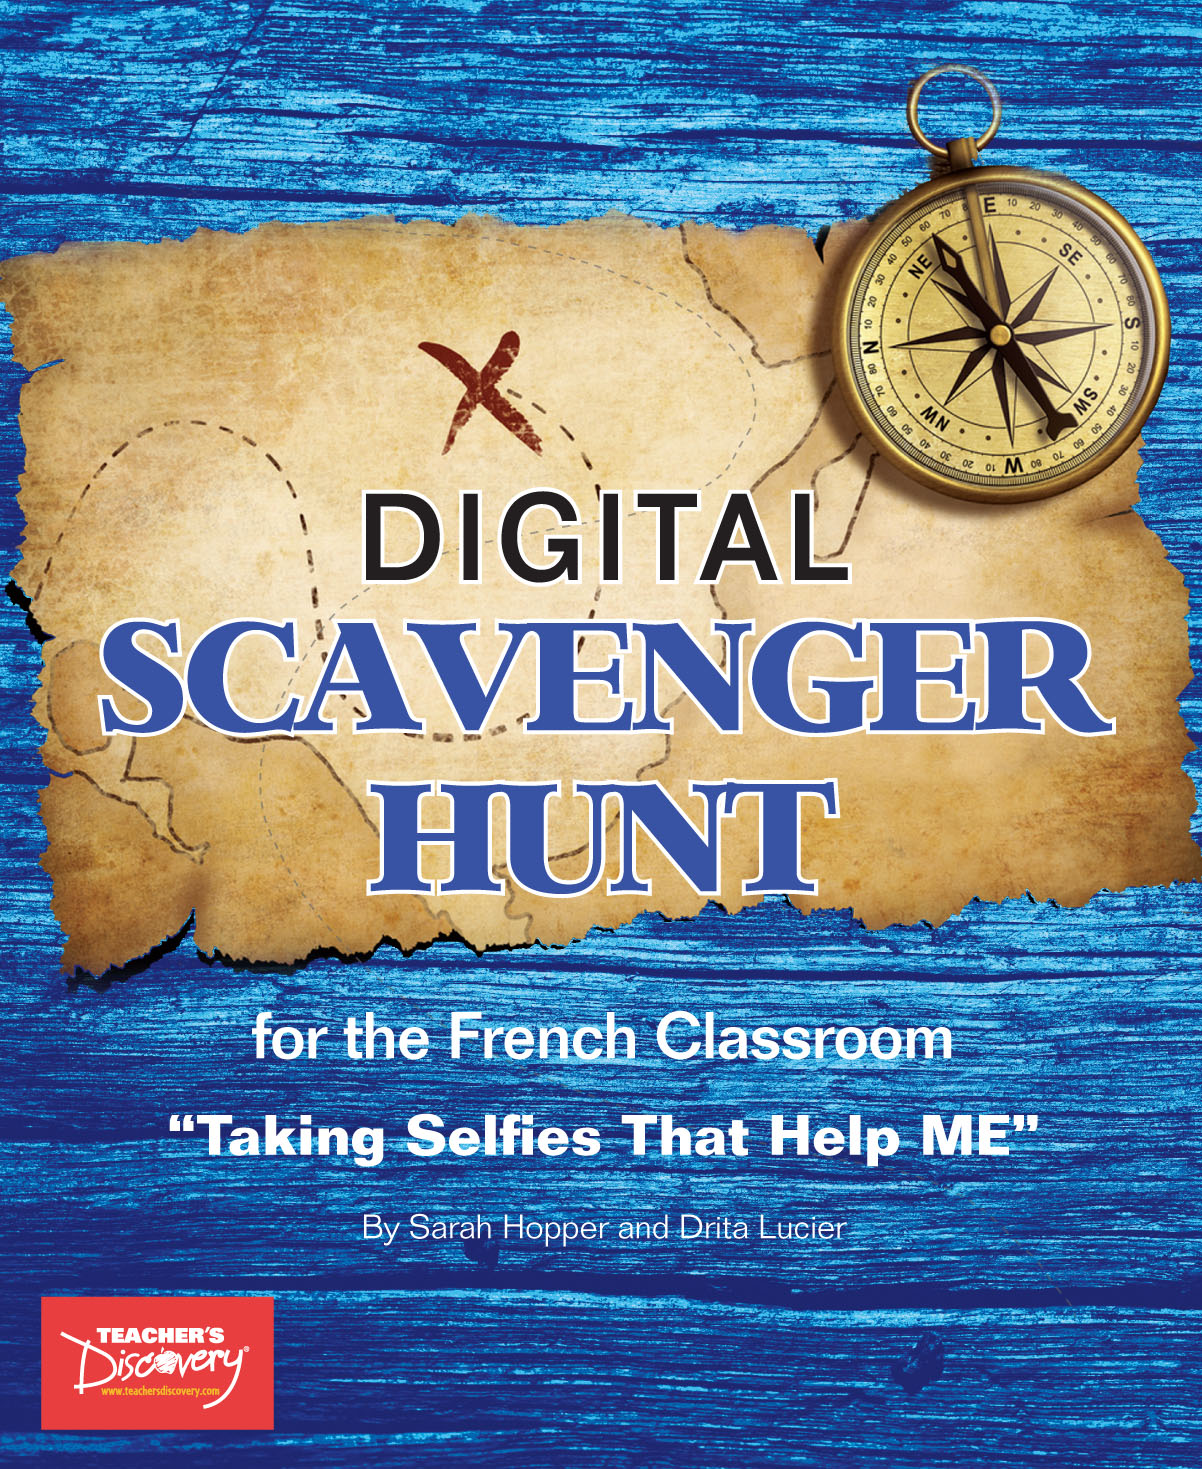 French Digital Scavenger Hunt Book Books Teacher S Discovery